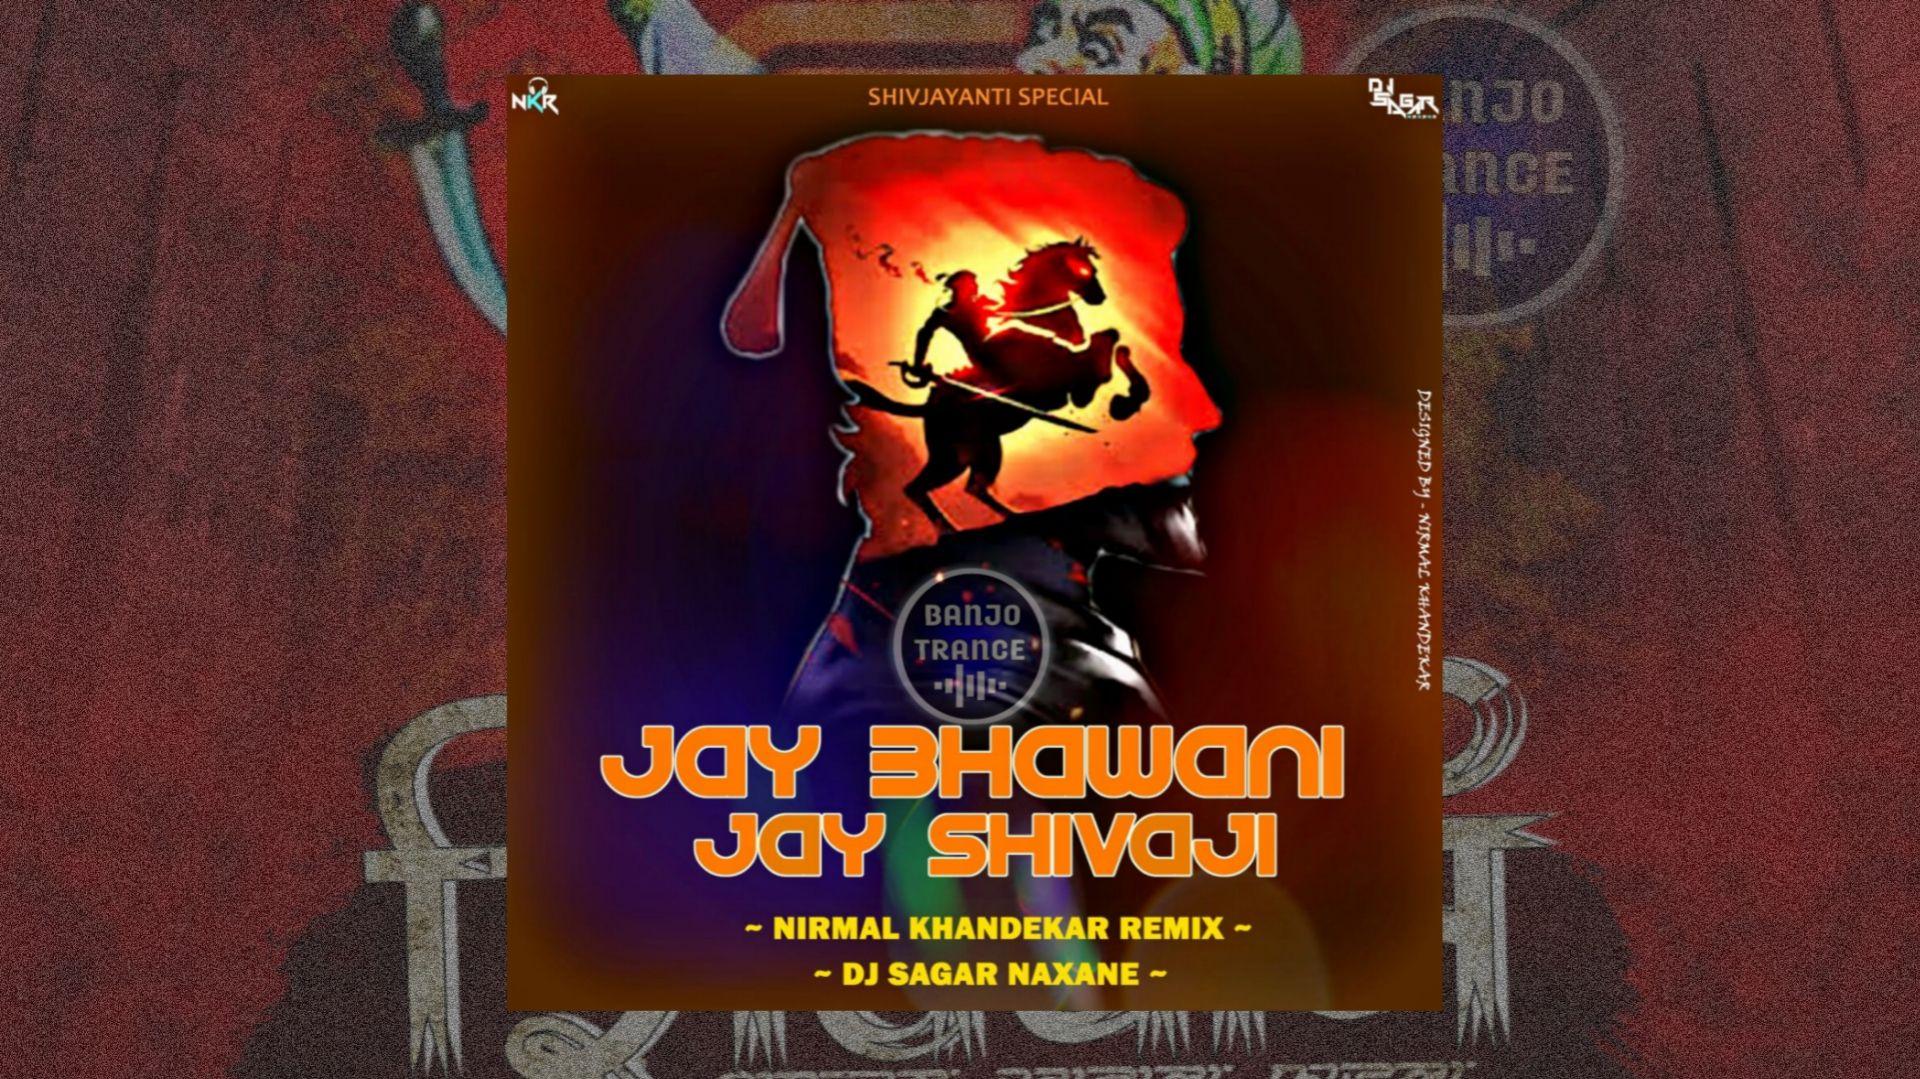 Jay Bhawani Jay Shivaji Nirmal Khandekar Remix Nkr X Dj Sagar Naxane Mp3 Songs Download Banjotrance In Free Download Ja Mp3 Song Download Mp3 Song Songs